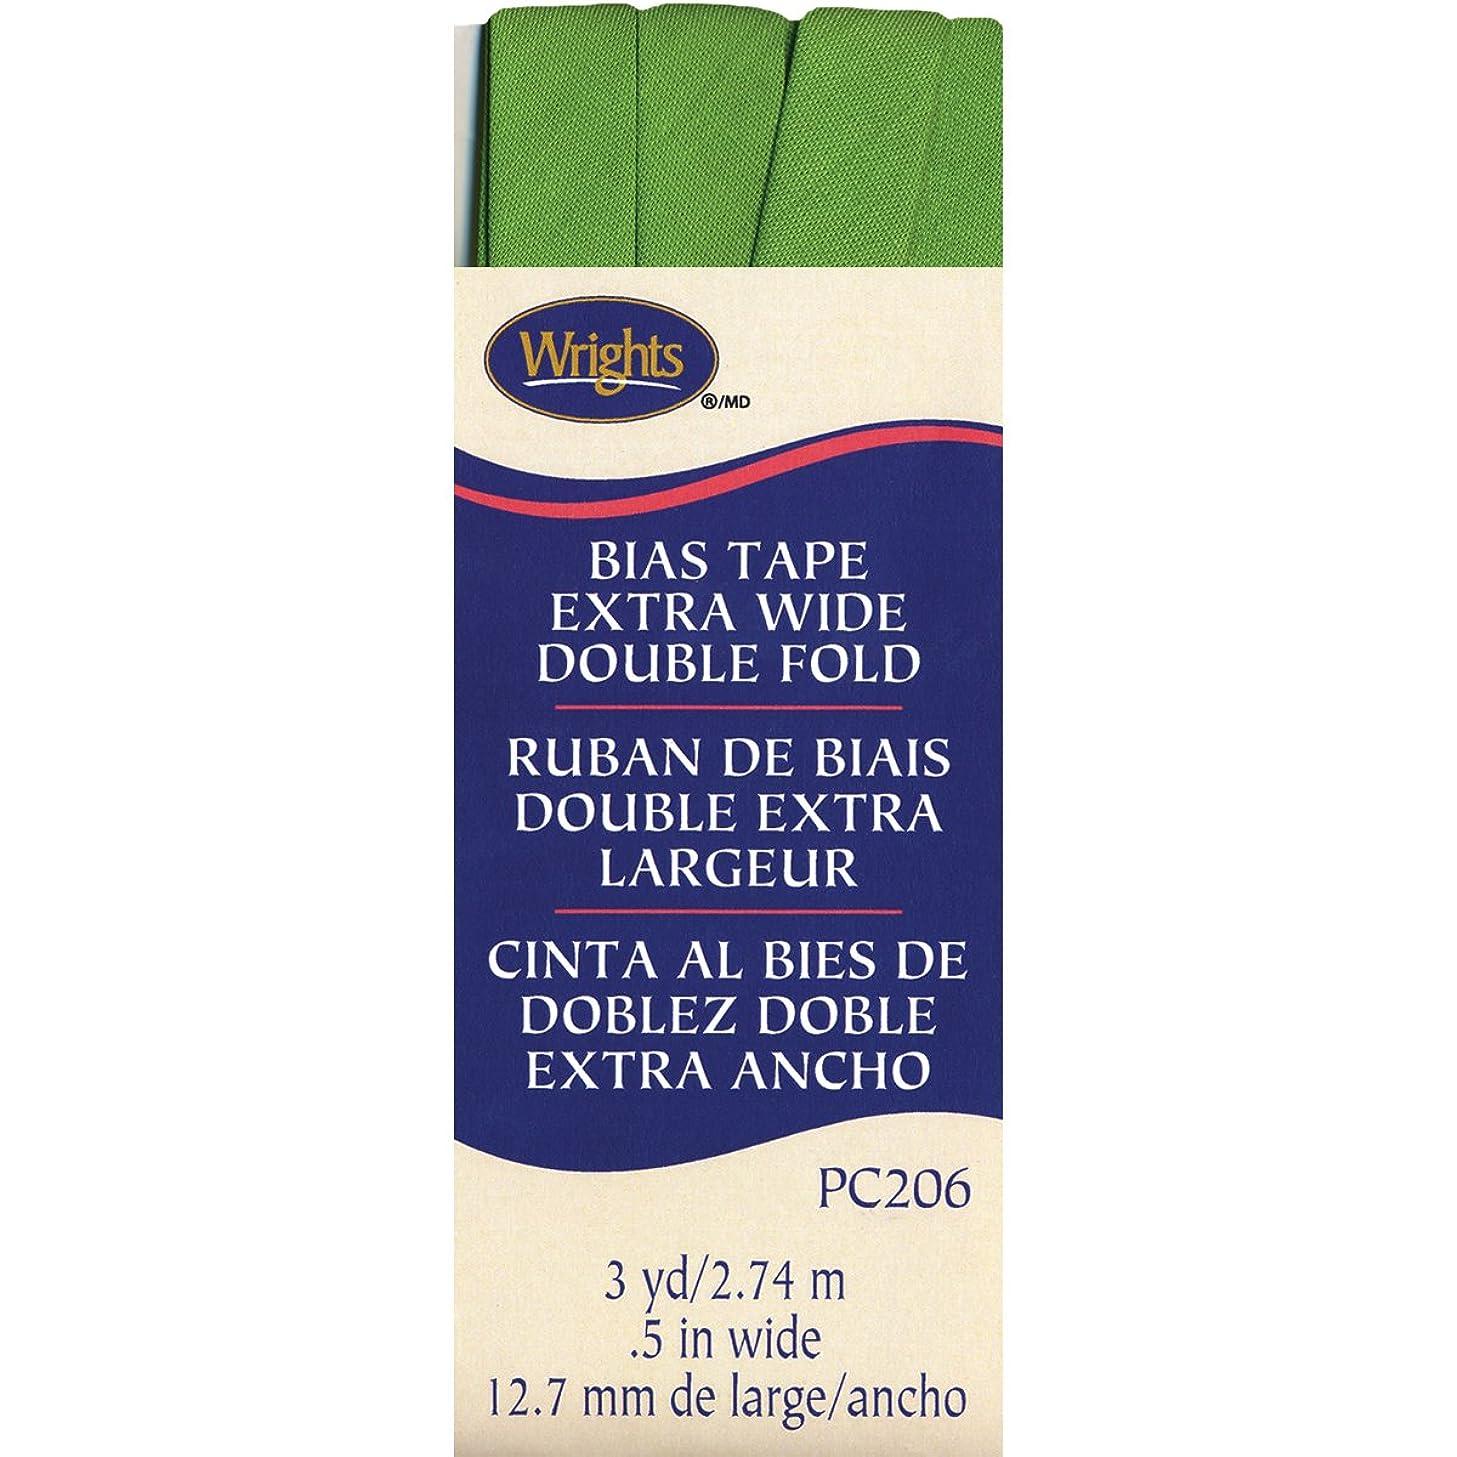 Wrights 117-206-1136 Double Fold Bias Tape, 1/2 by 3-Yard, Kiwi